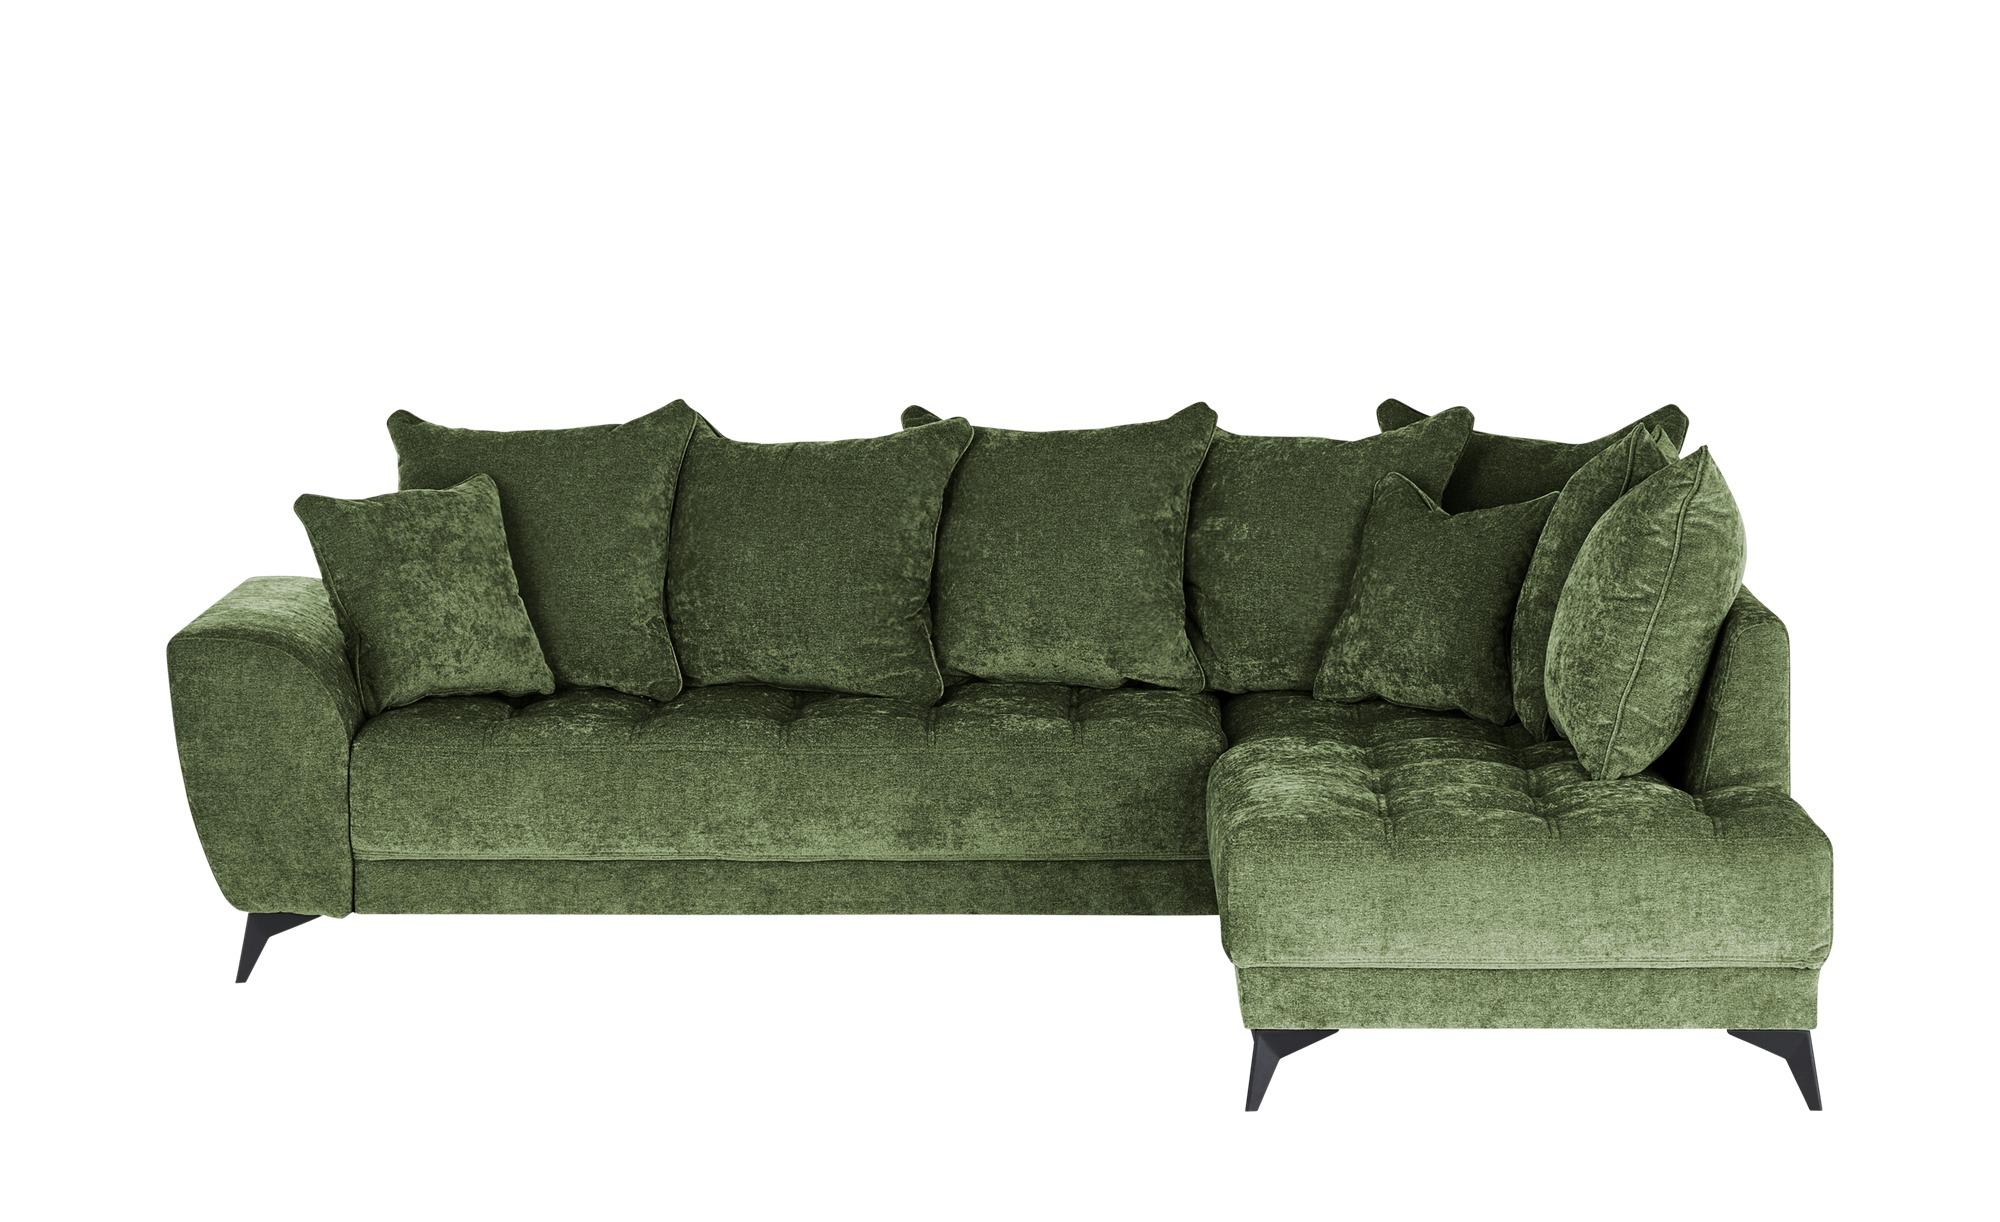 smart Ecksofa  Bella ¦ grün ¦ Maße (cm): H: 100 Polstermöbel > Sofas > Ecksofas - Höffner